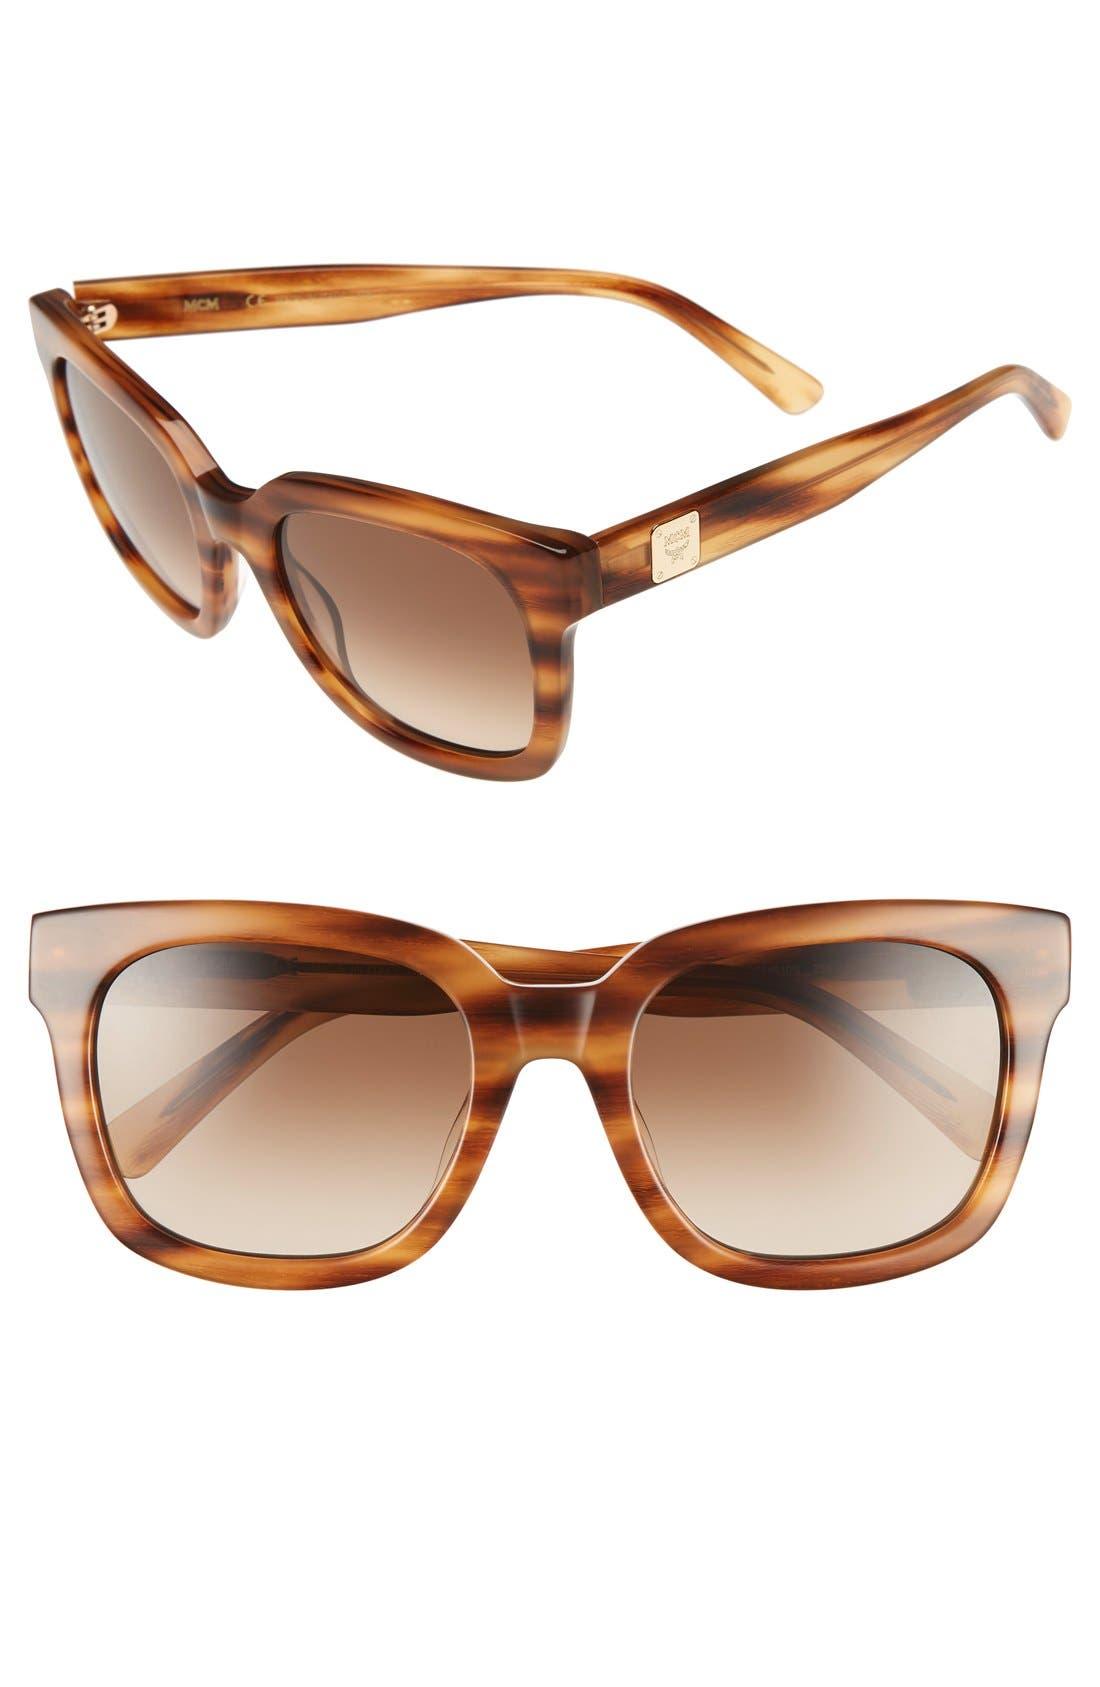 54mm Retro Sunglasses,                         Main,                         color, Striped Cognac